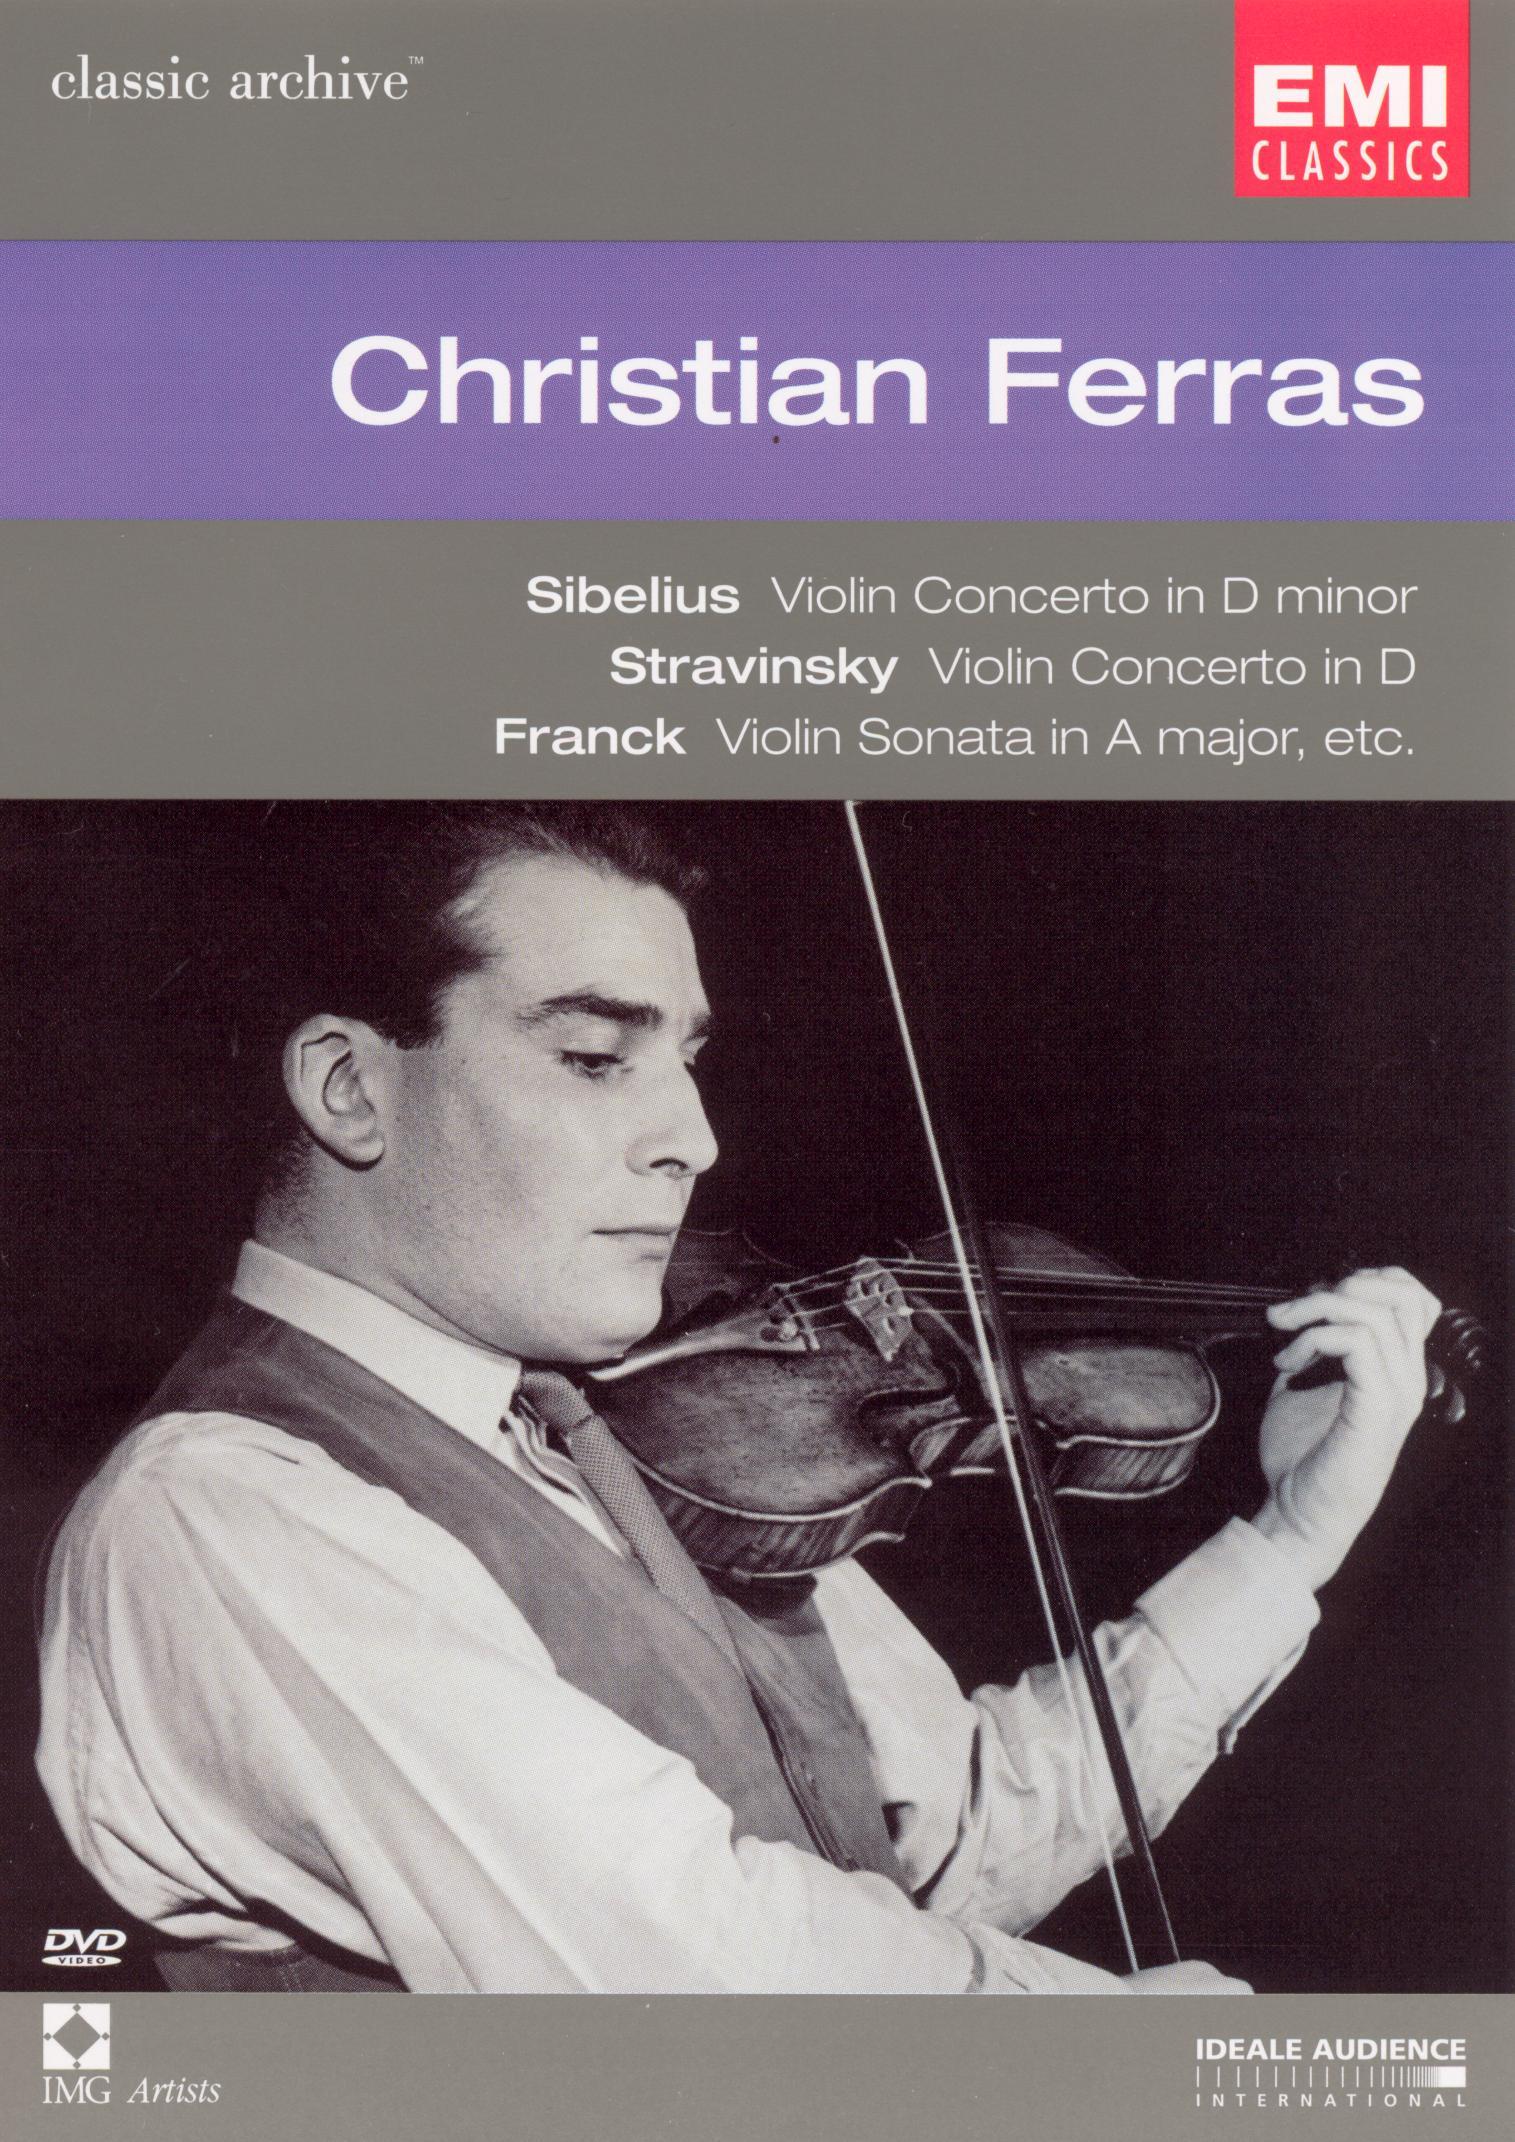 Classic Archive: Christian Ferras